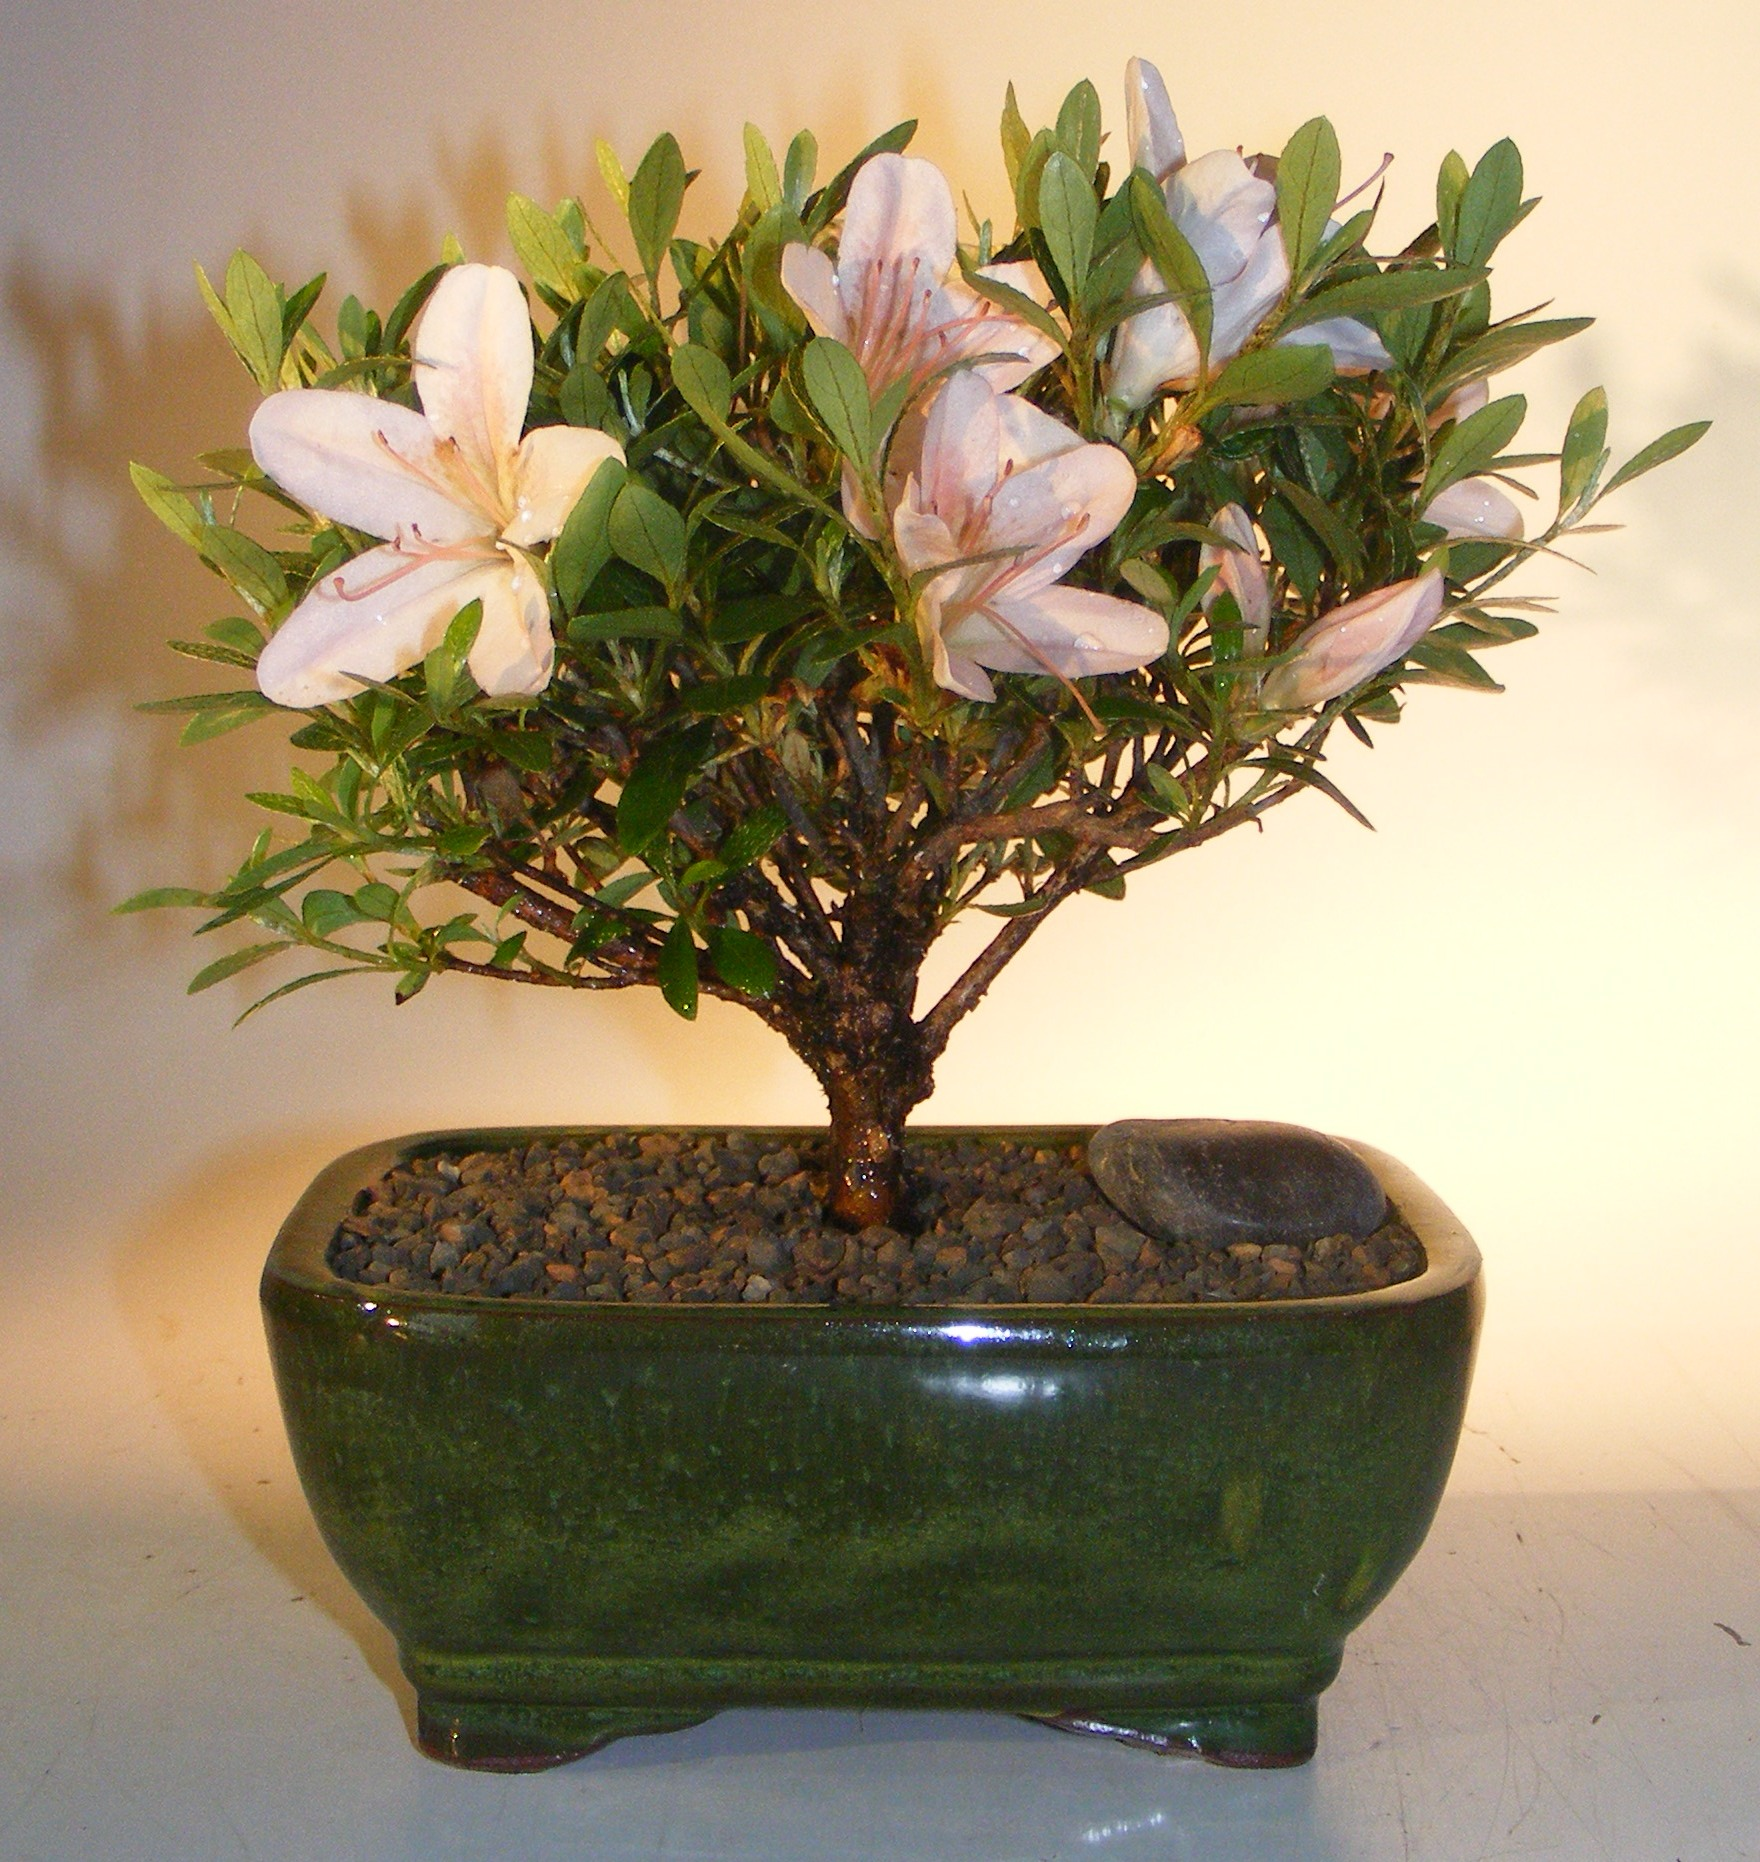 Flowering Azalea Bonsai Tree(Rhododendron 'obtusum') Image